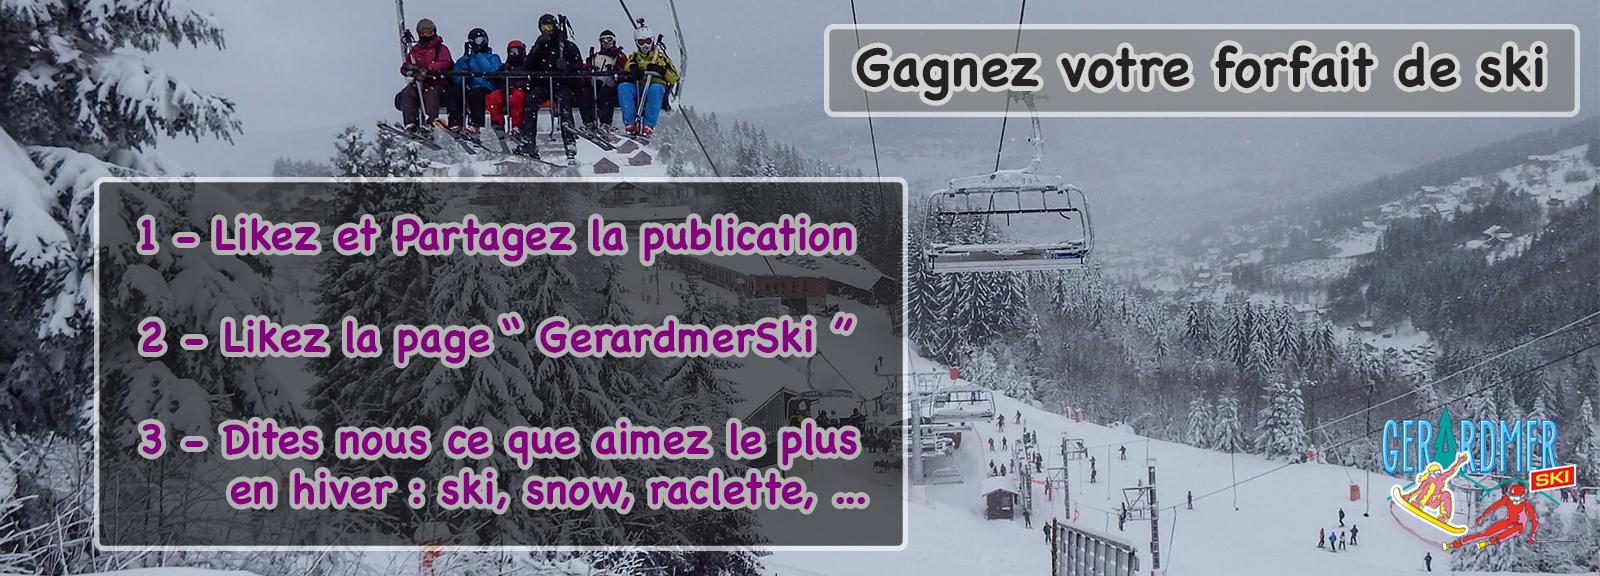 Jeux Concours - Ski 2017